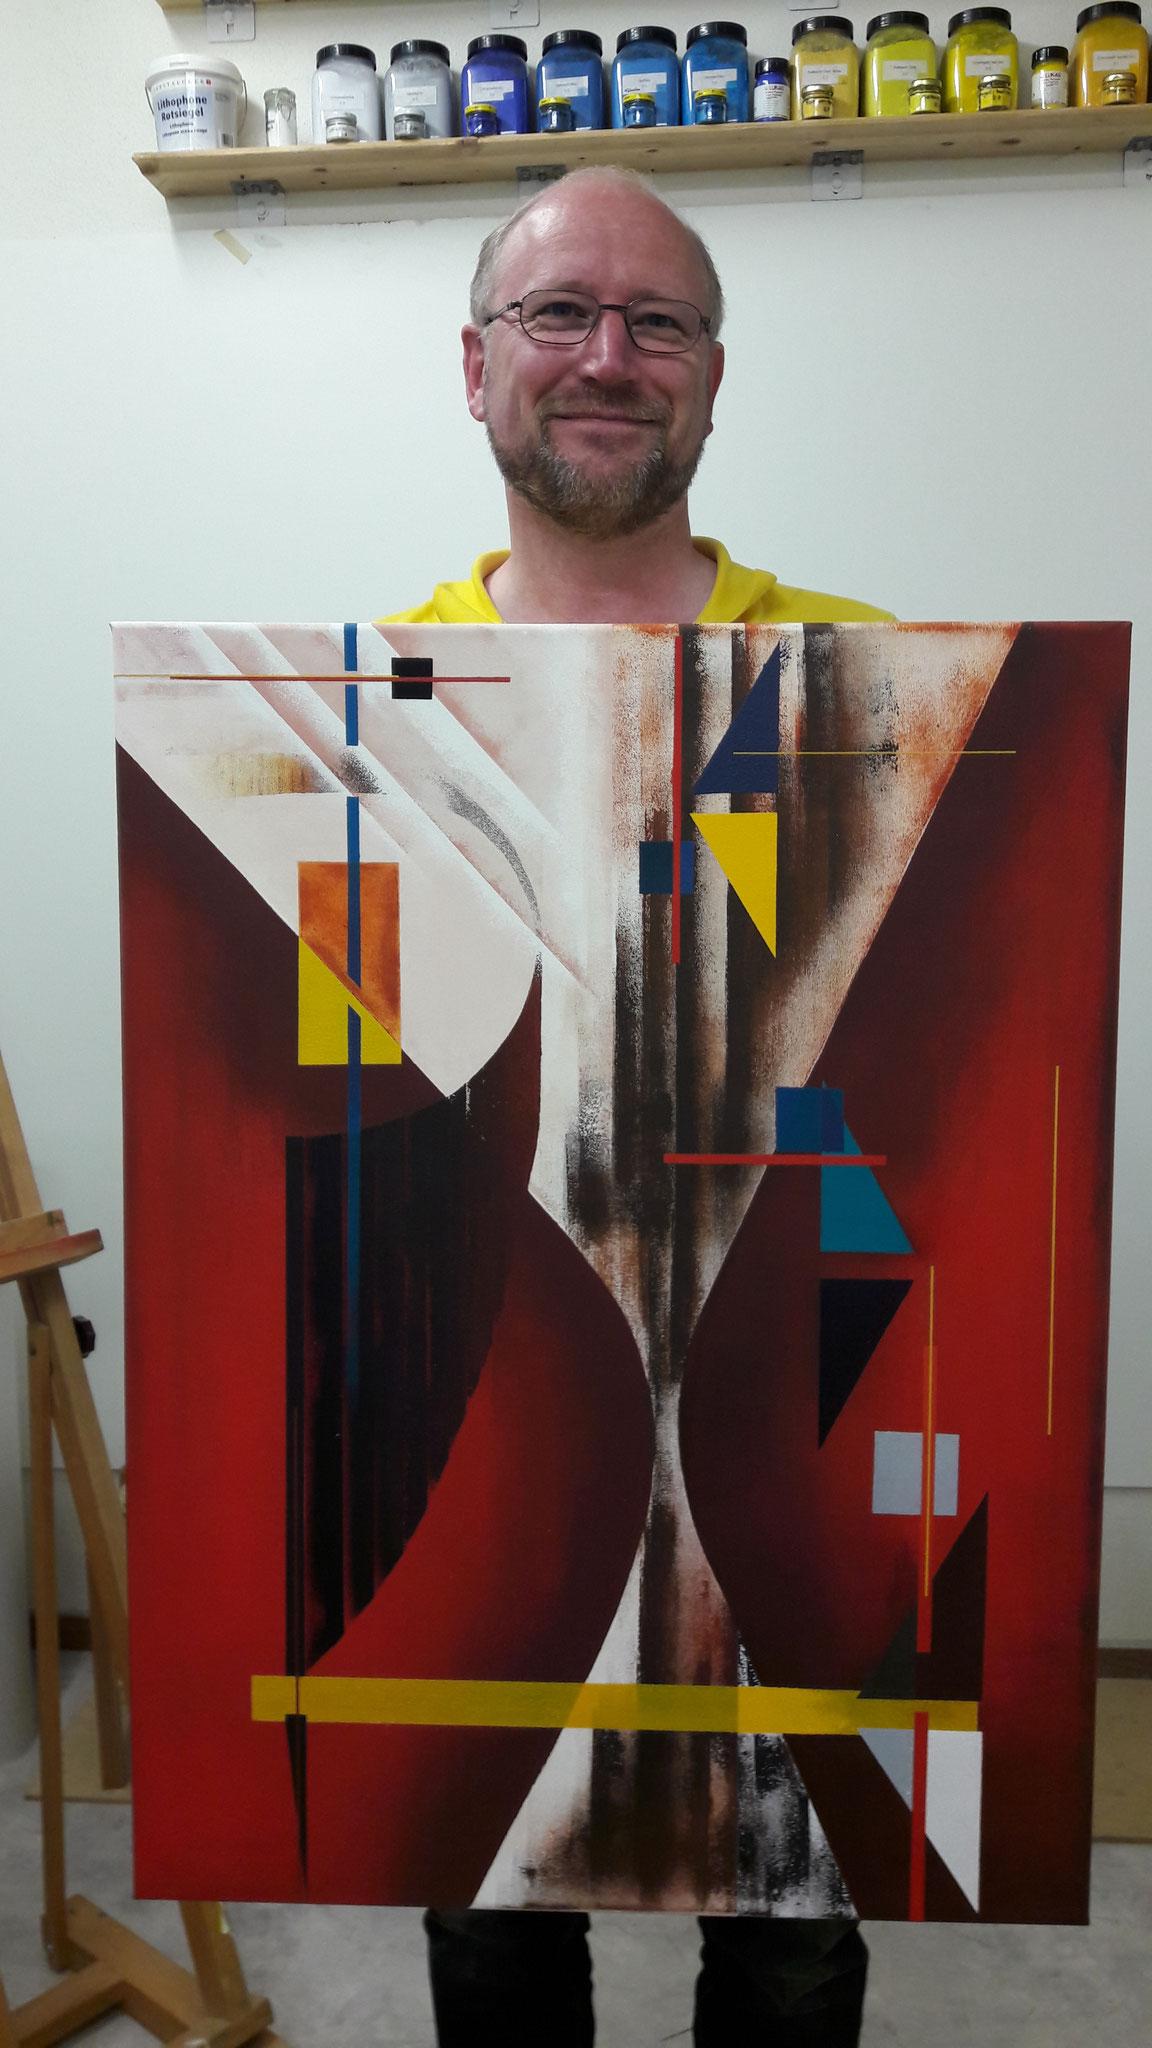 Acryl auf Leinwand, Michael Bühler